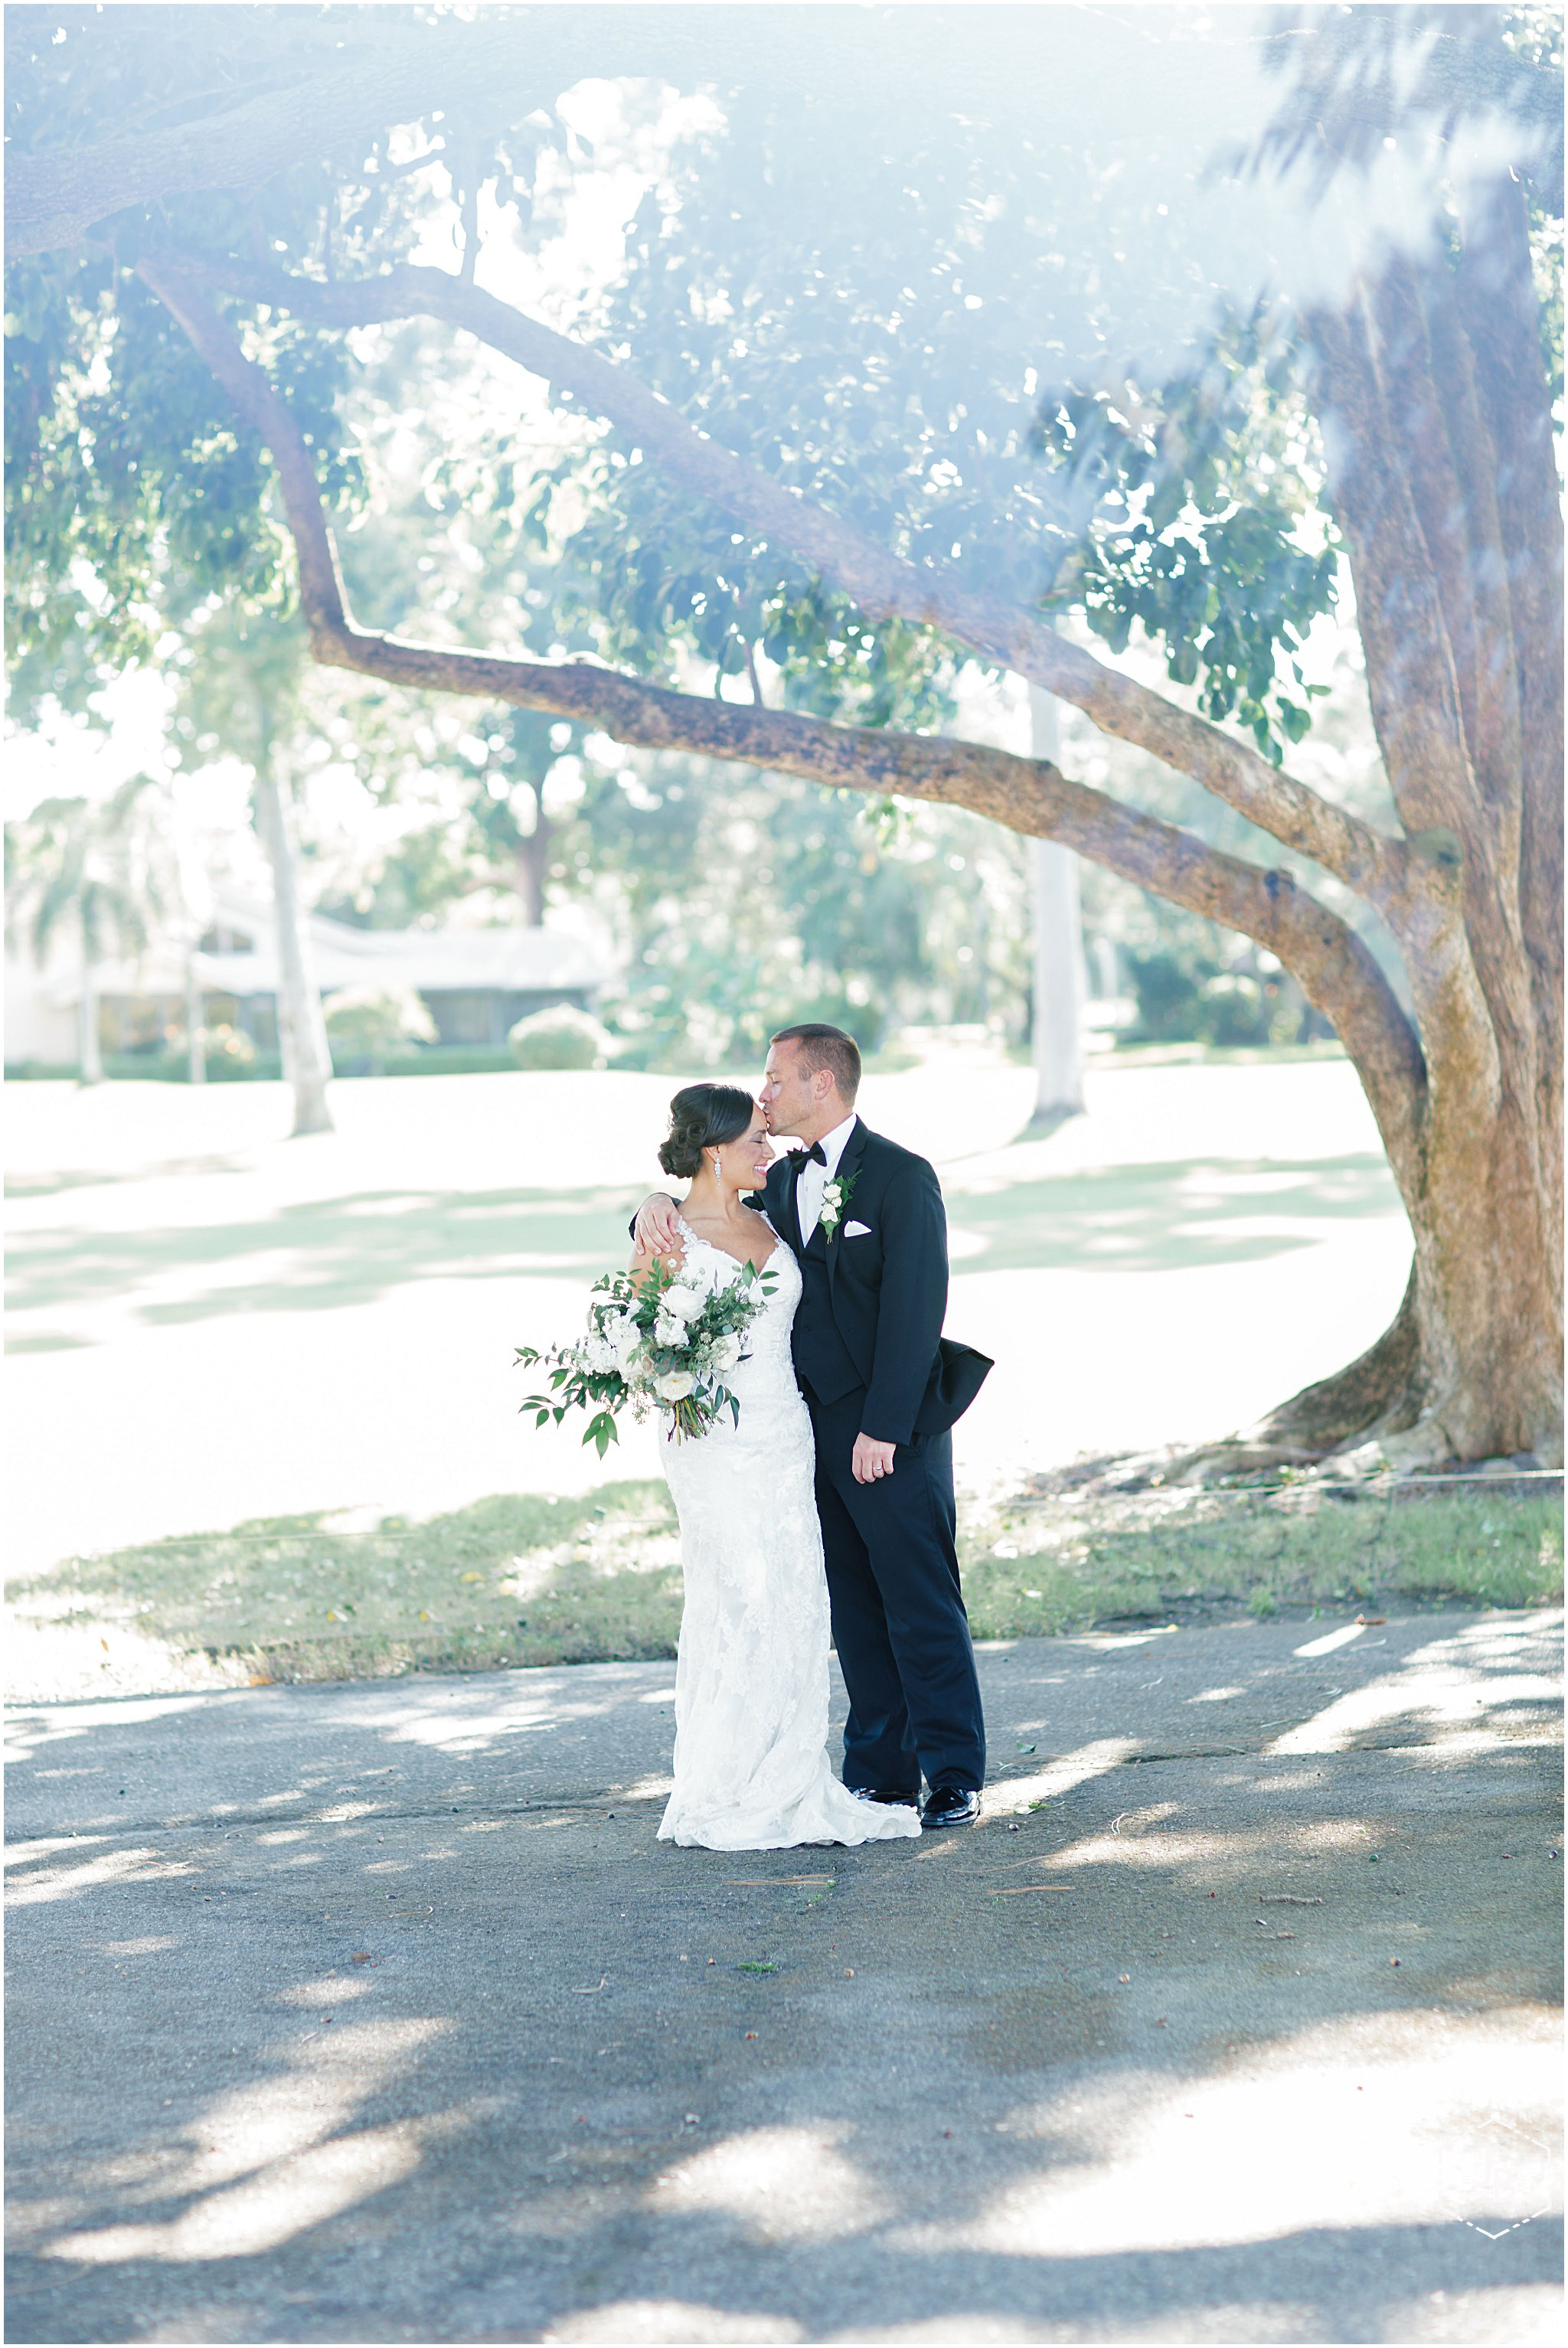 WeddingandEngagementFloridaPhotographer_0245.jpg